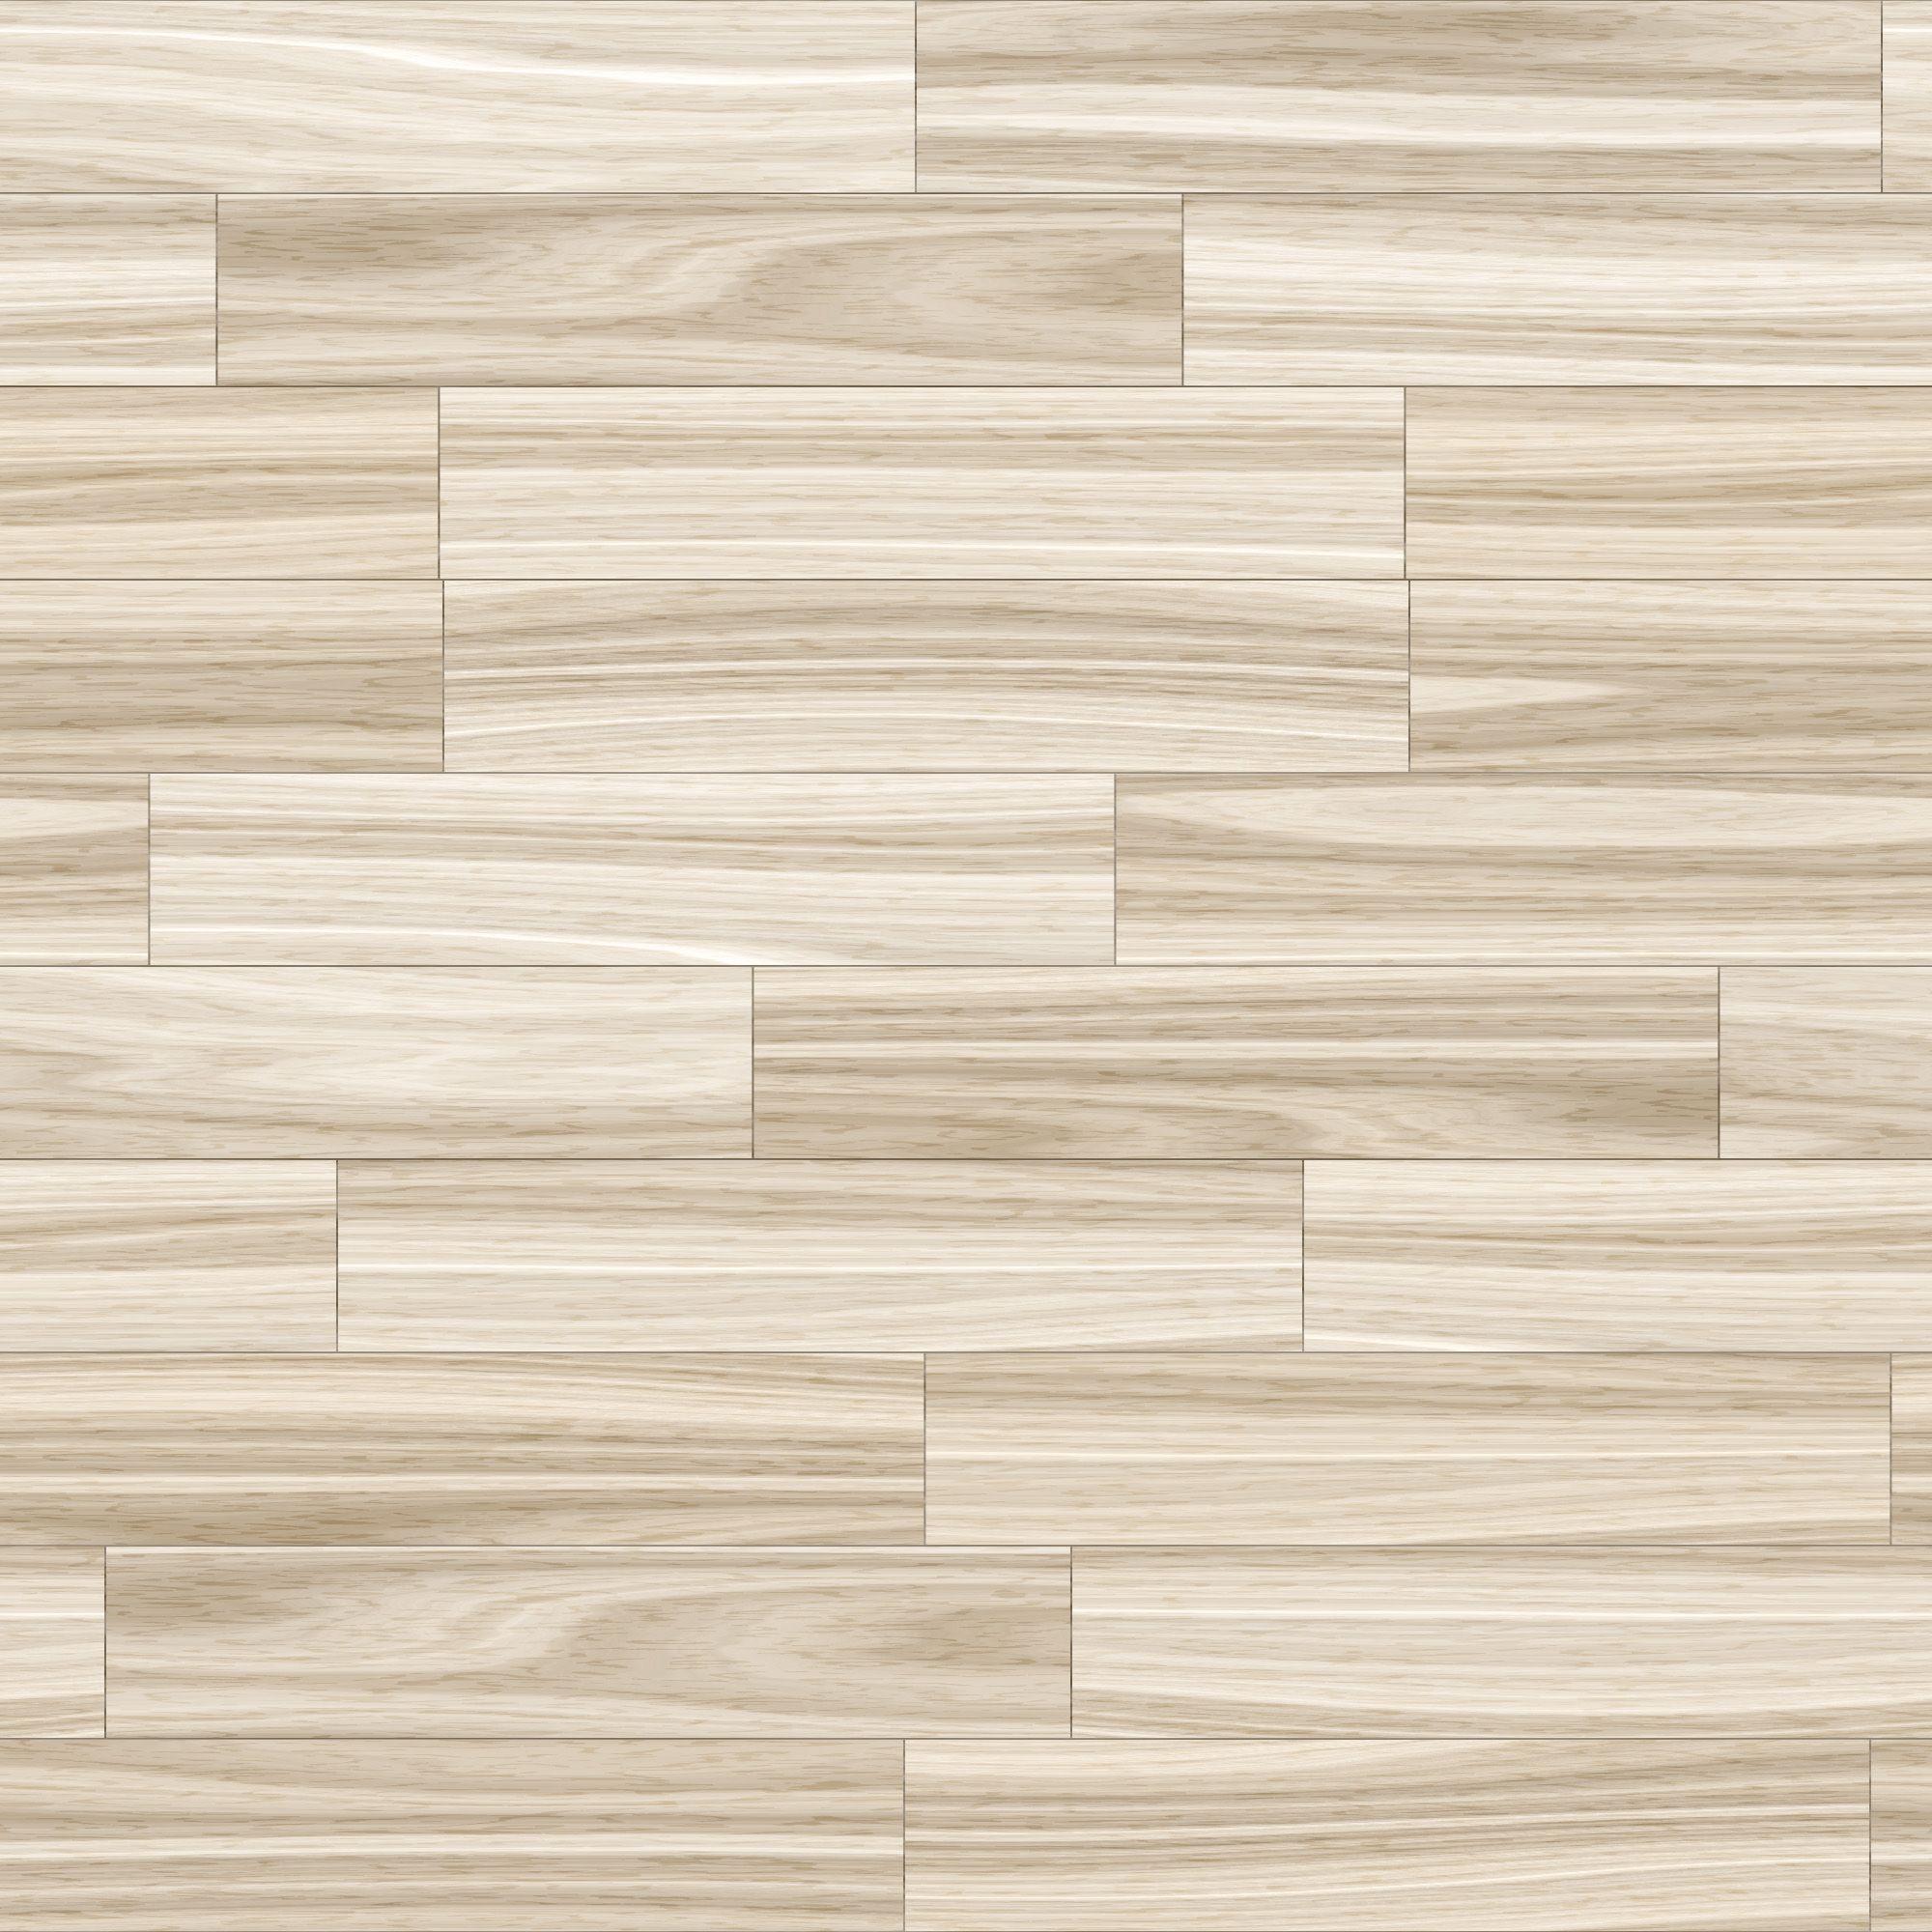 grey brown seamless wooden flooring texture http//www